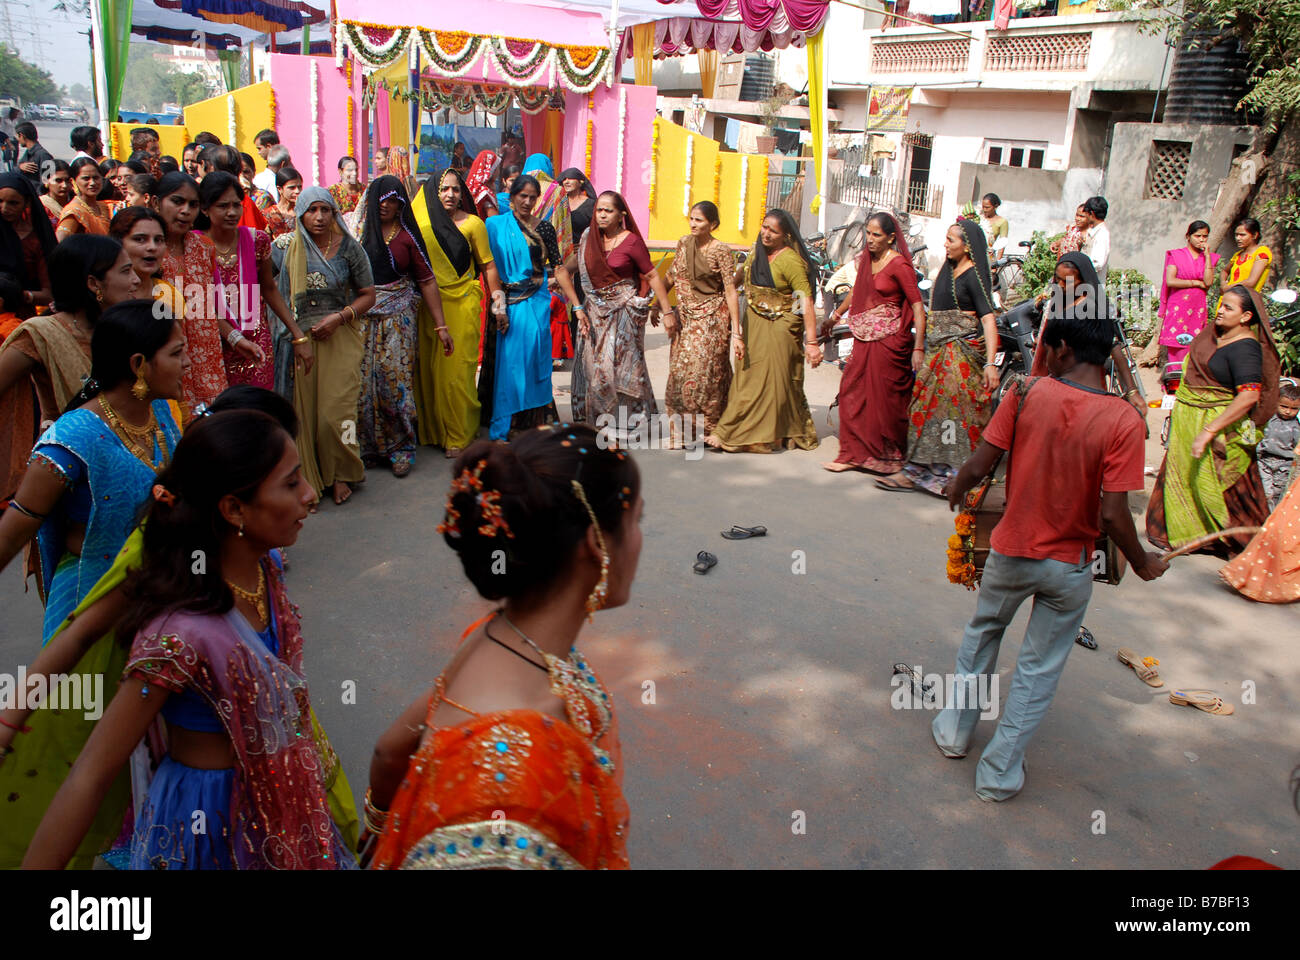 A wedding scene in Ahmedabad, Gujarat, India. - Stock Image